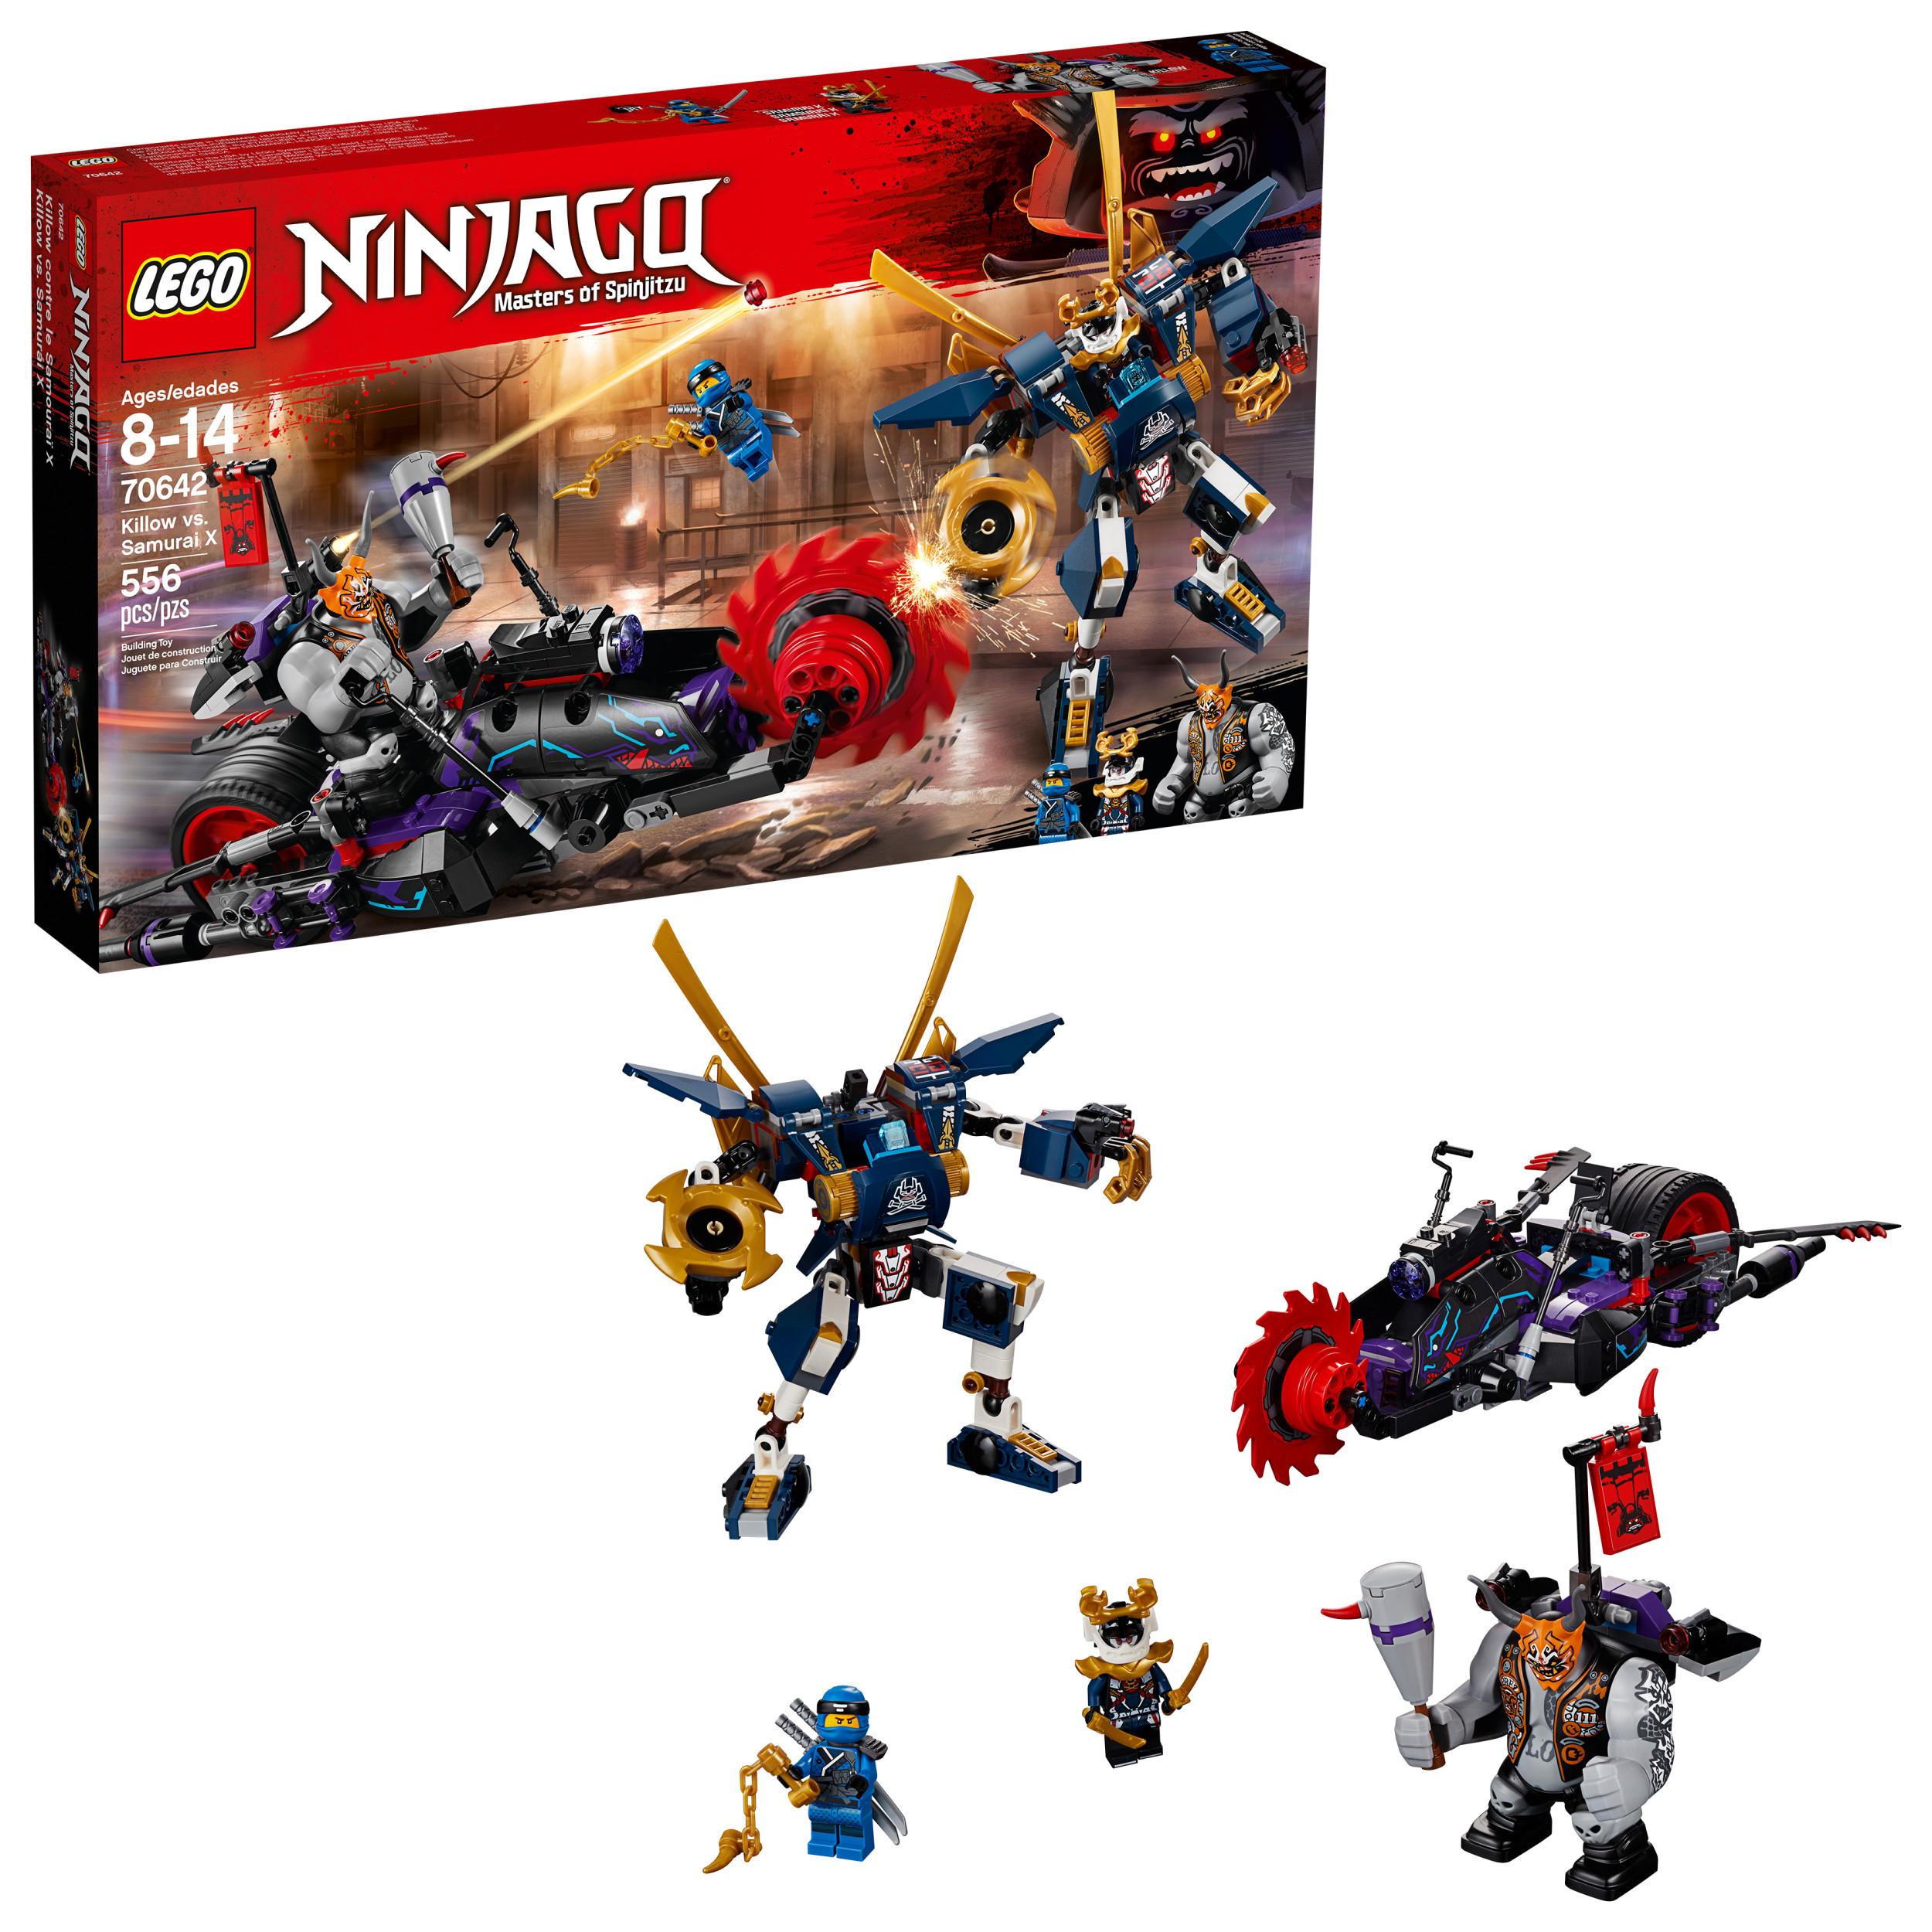 LEGO Ninjago Killow vs. Samurai X 70642 (556 Pieces)